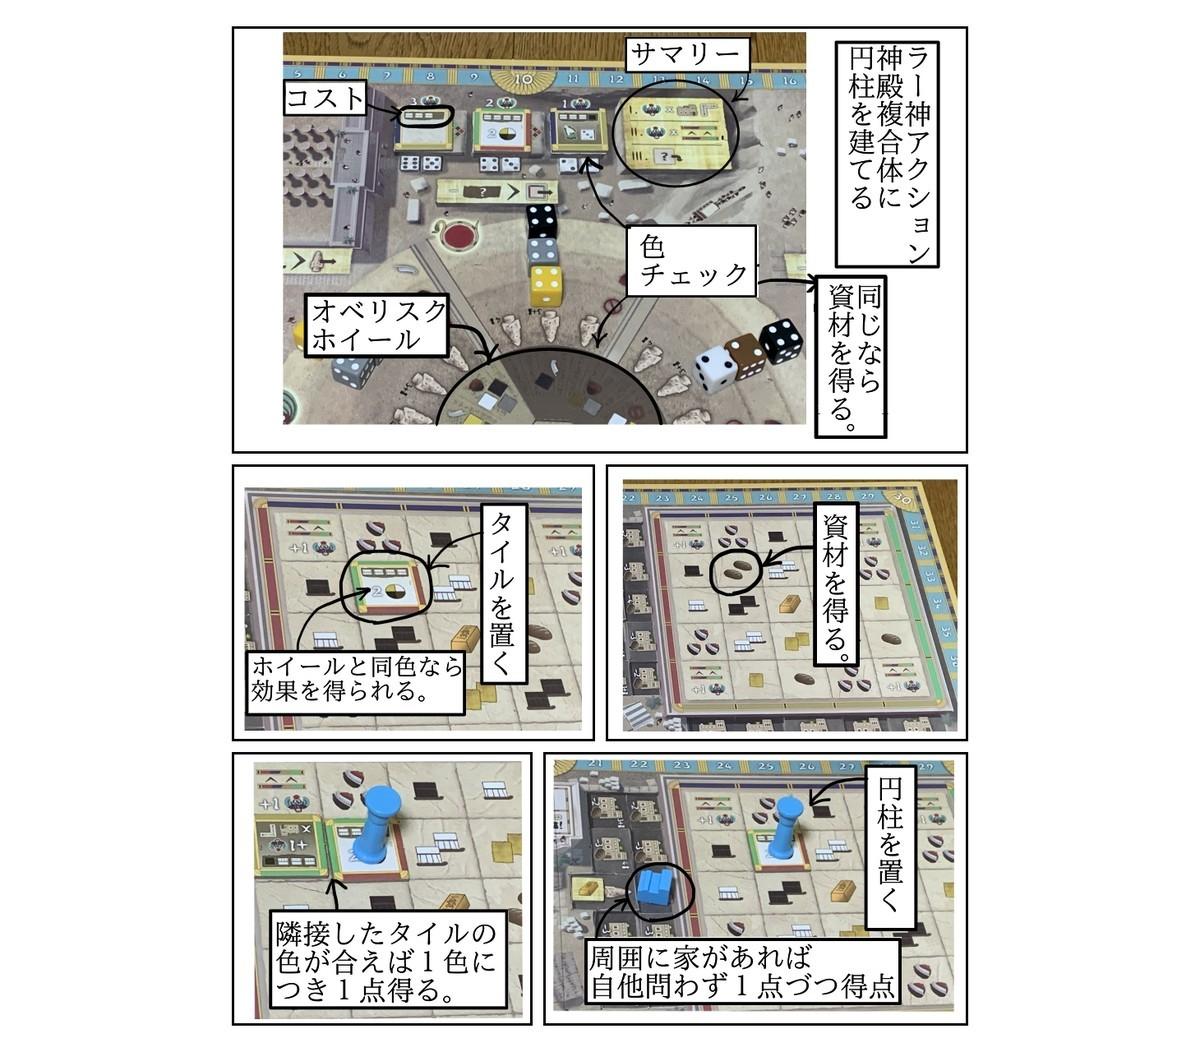 f:id:toratoranotora:20210522110216j:plain